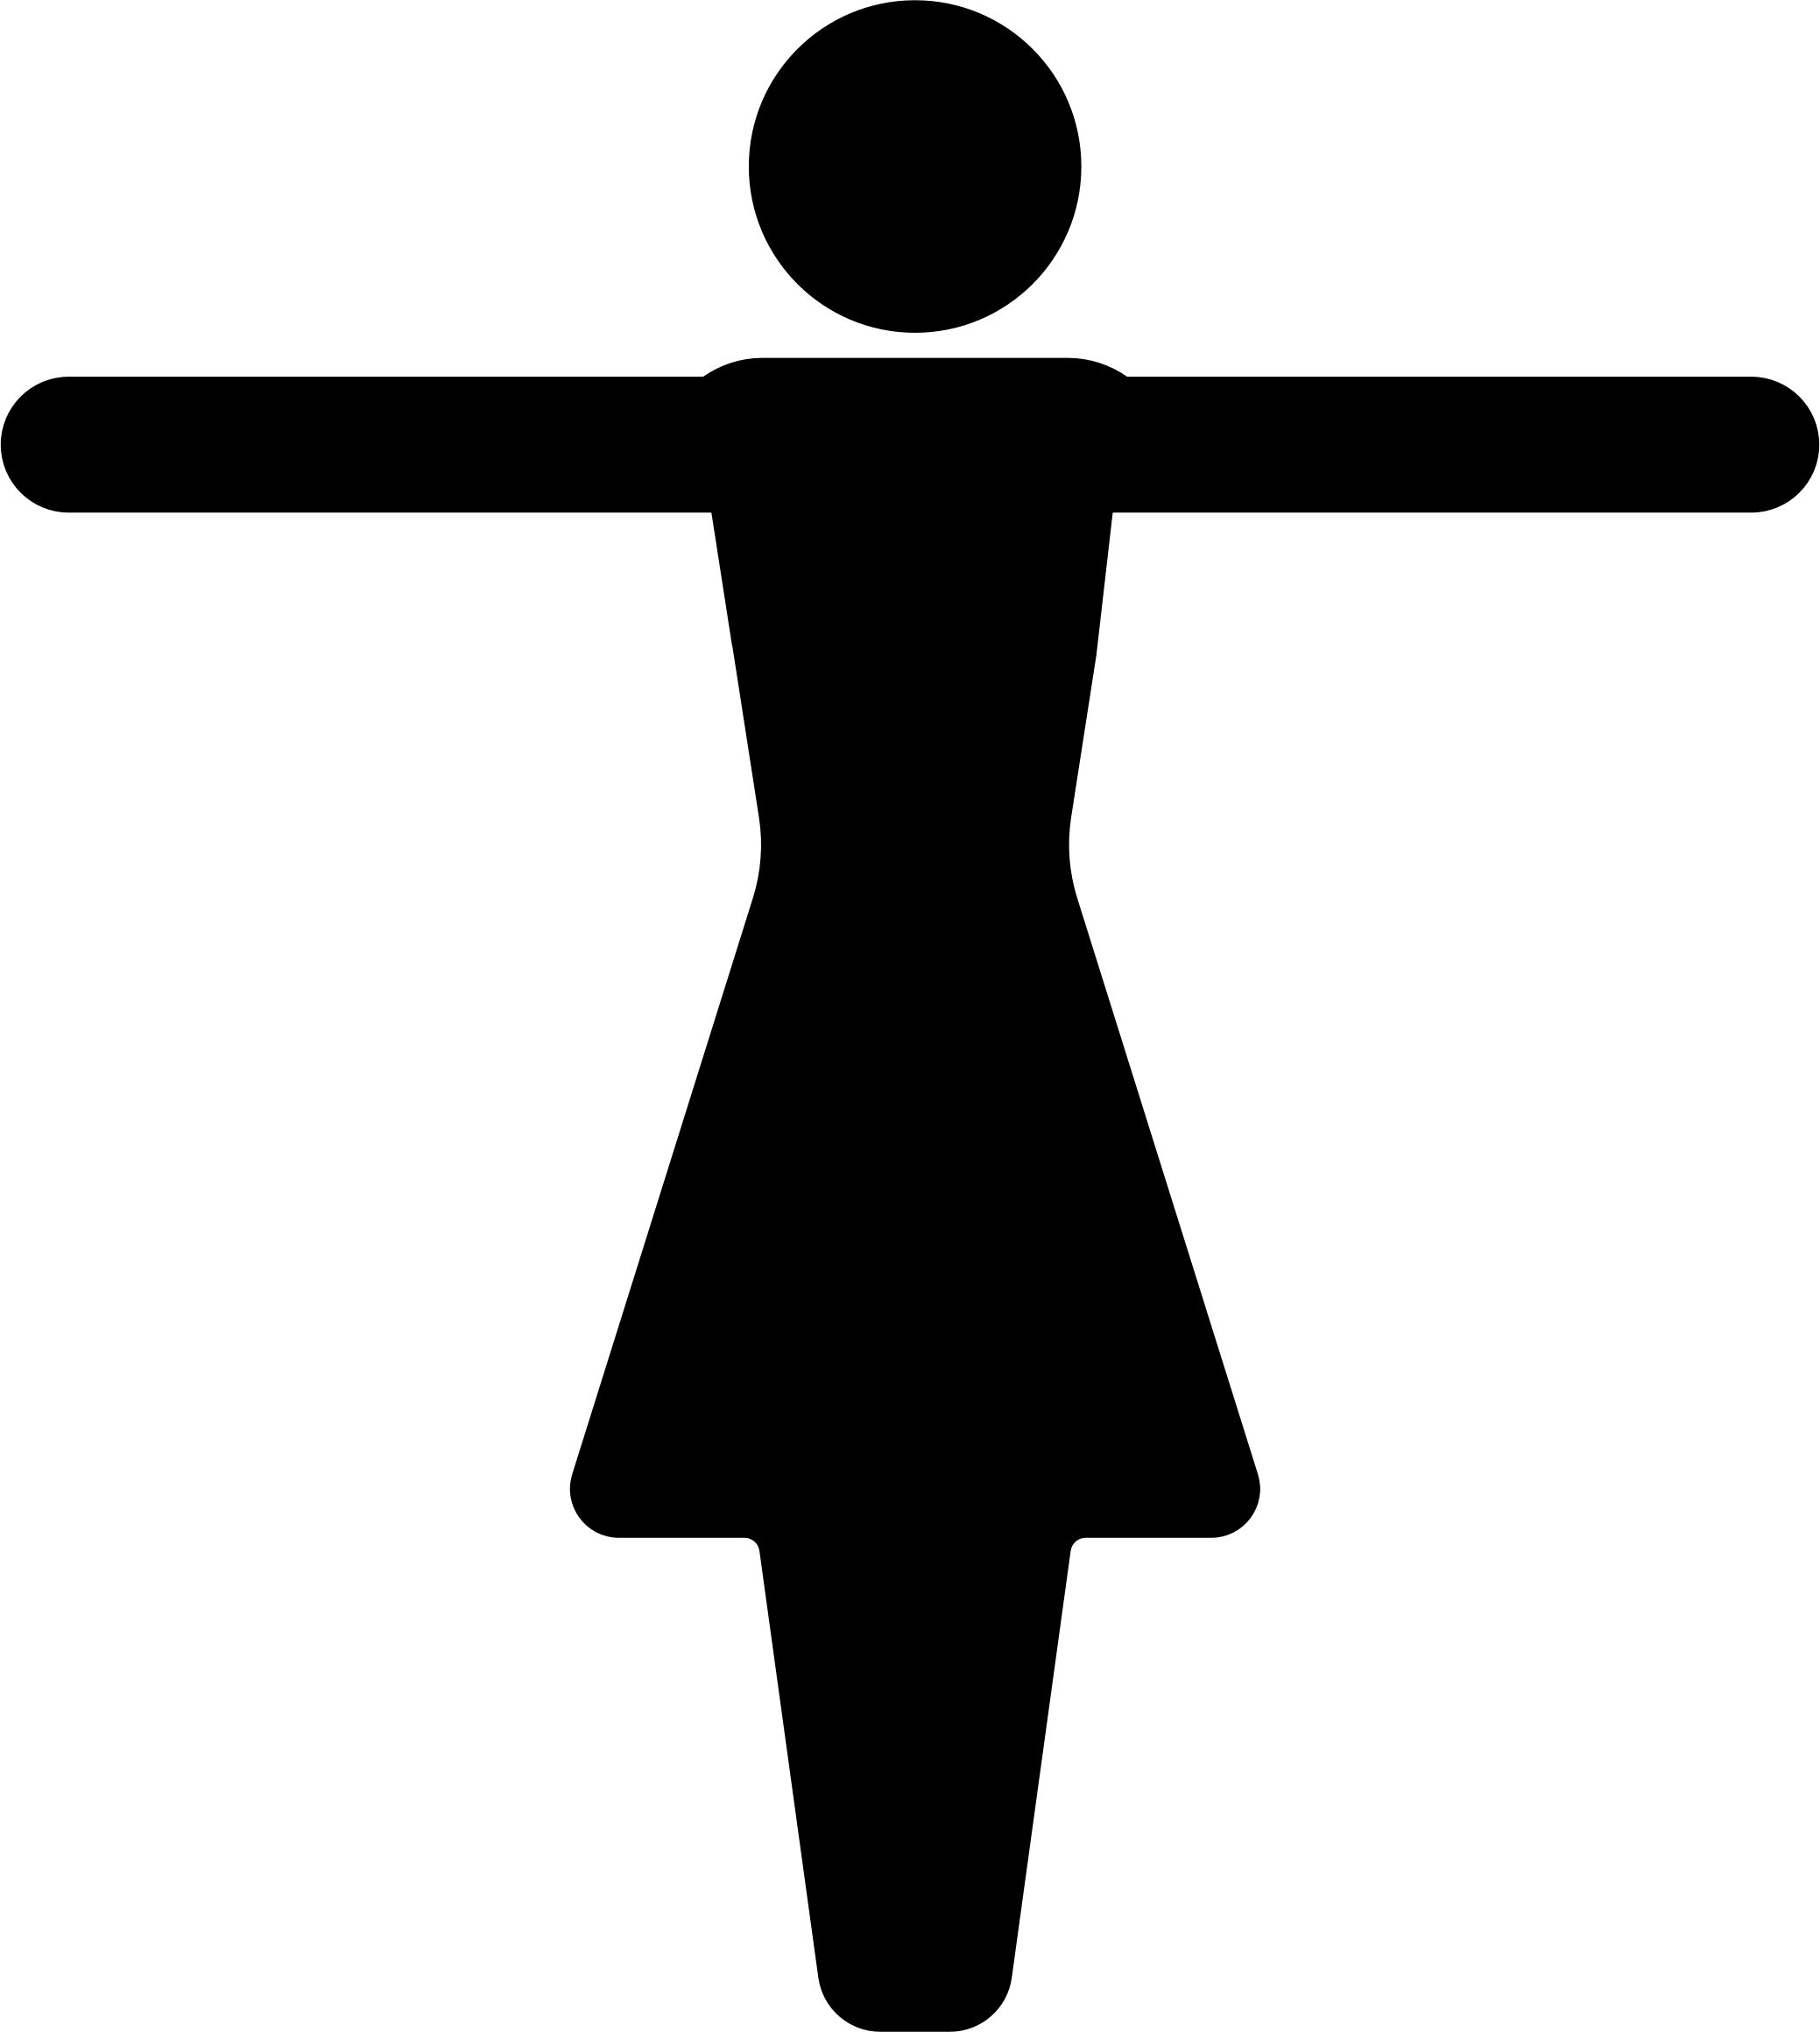 2078x2320 Clipart